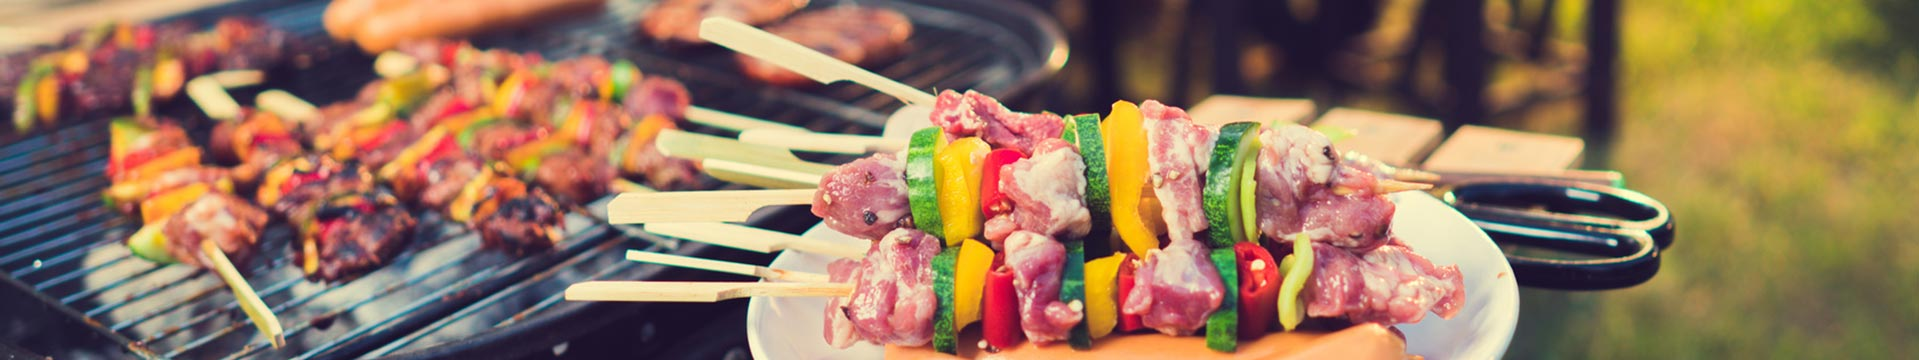 Barbecues e Piqueniques